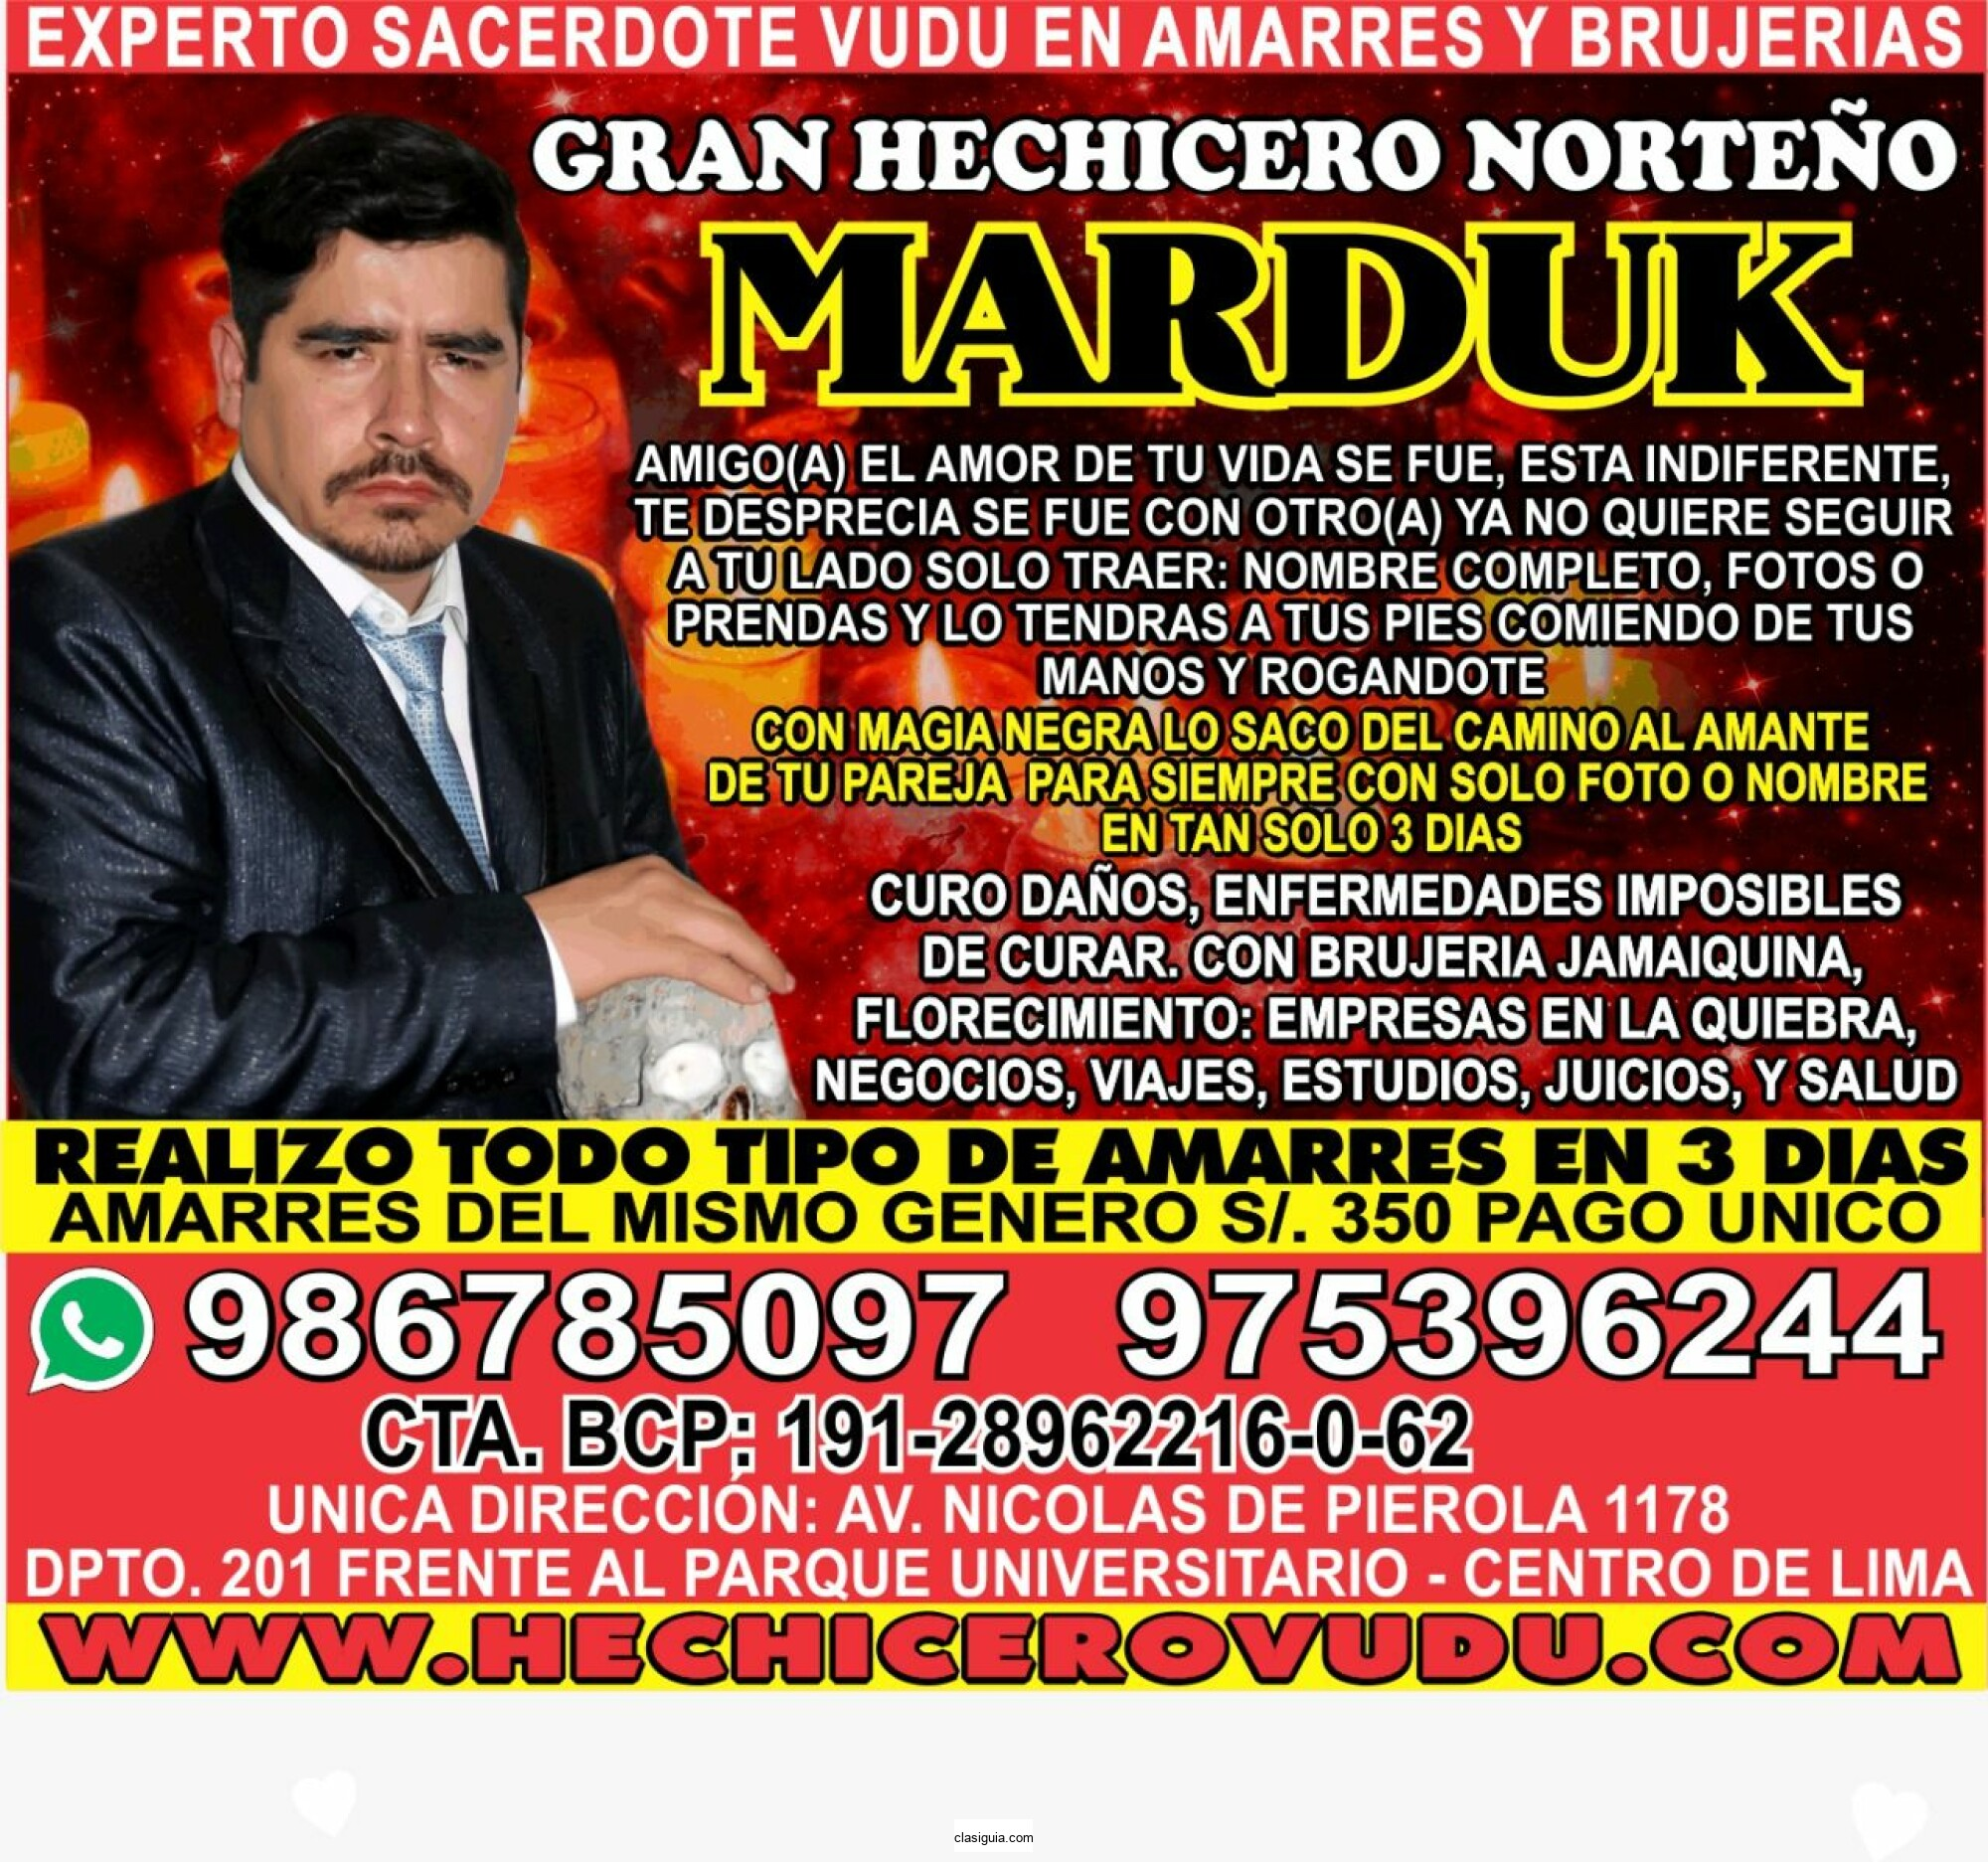 MAESTRO MARDUK 986785097